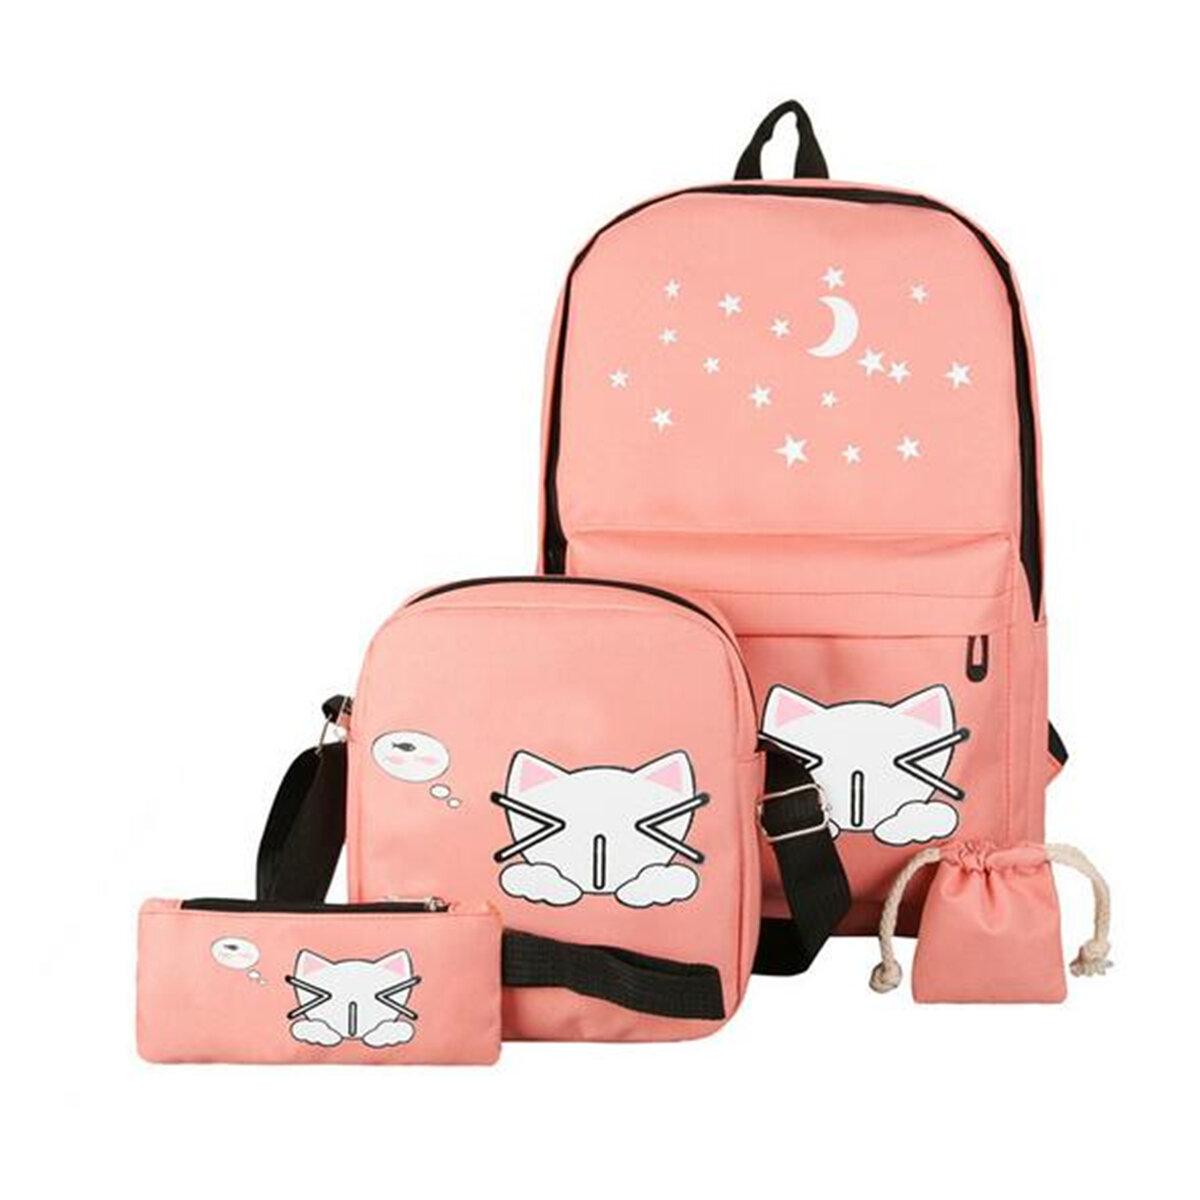 4PCS Women Girls Canvas School Backpack Travel Rucksack Shoulder Bag Purse